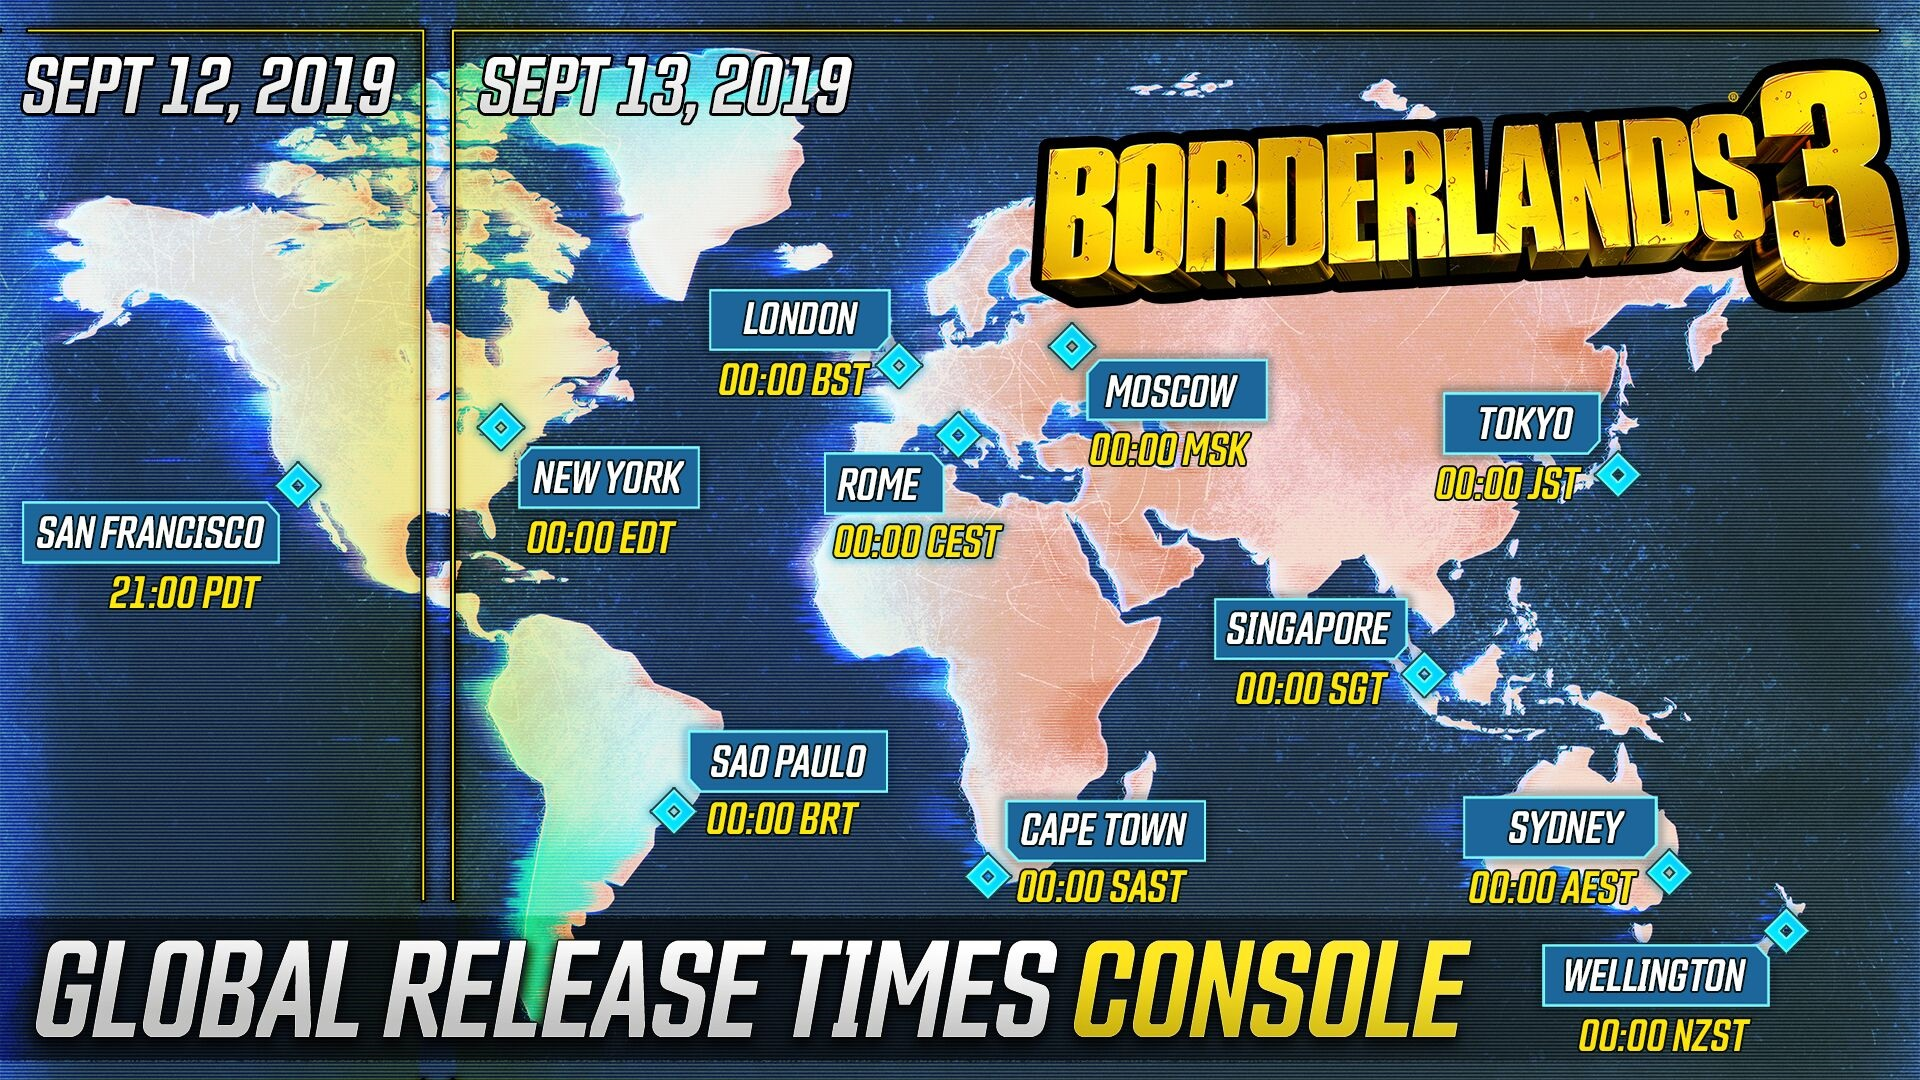 Borderlands 3 Console Release Times